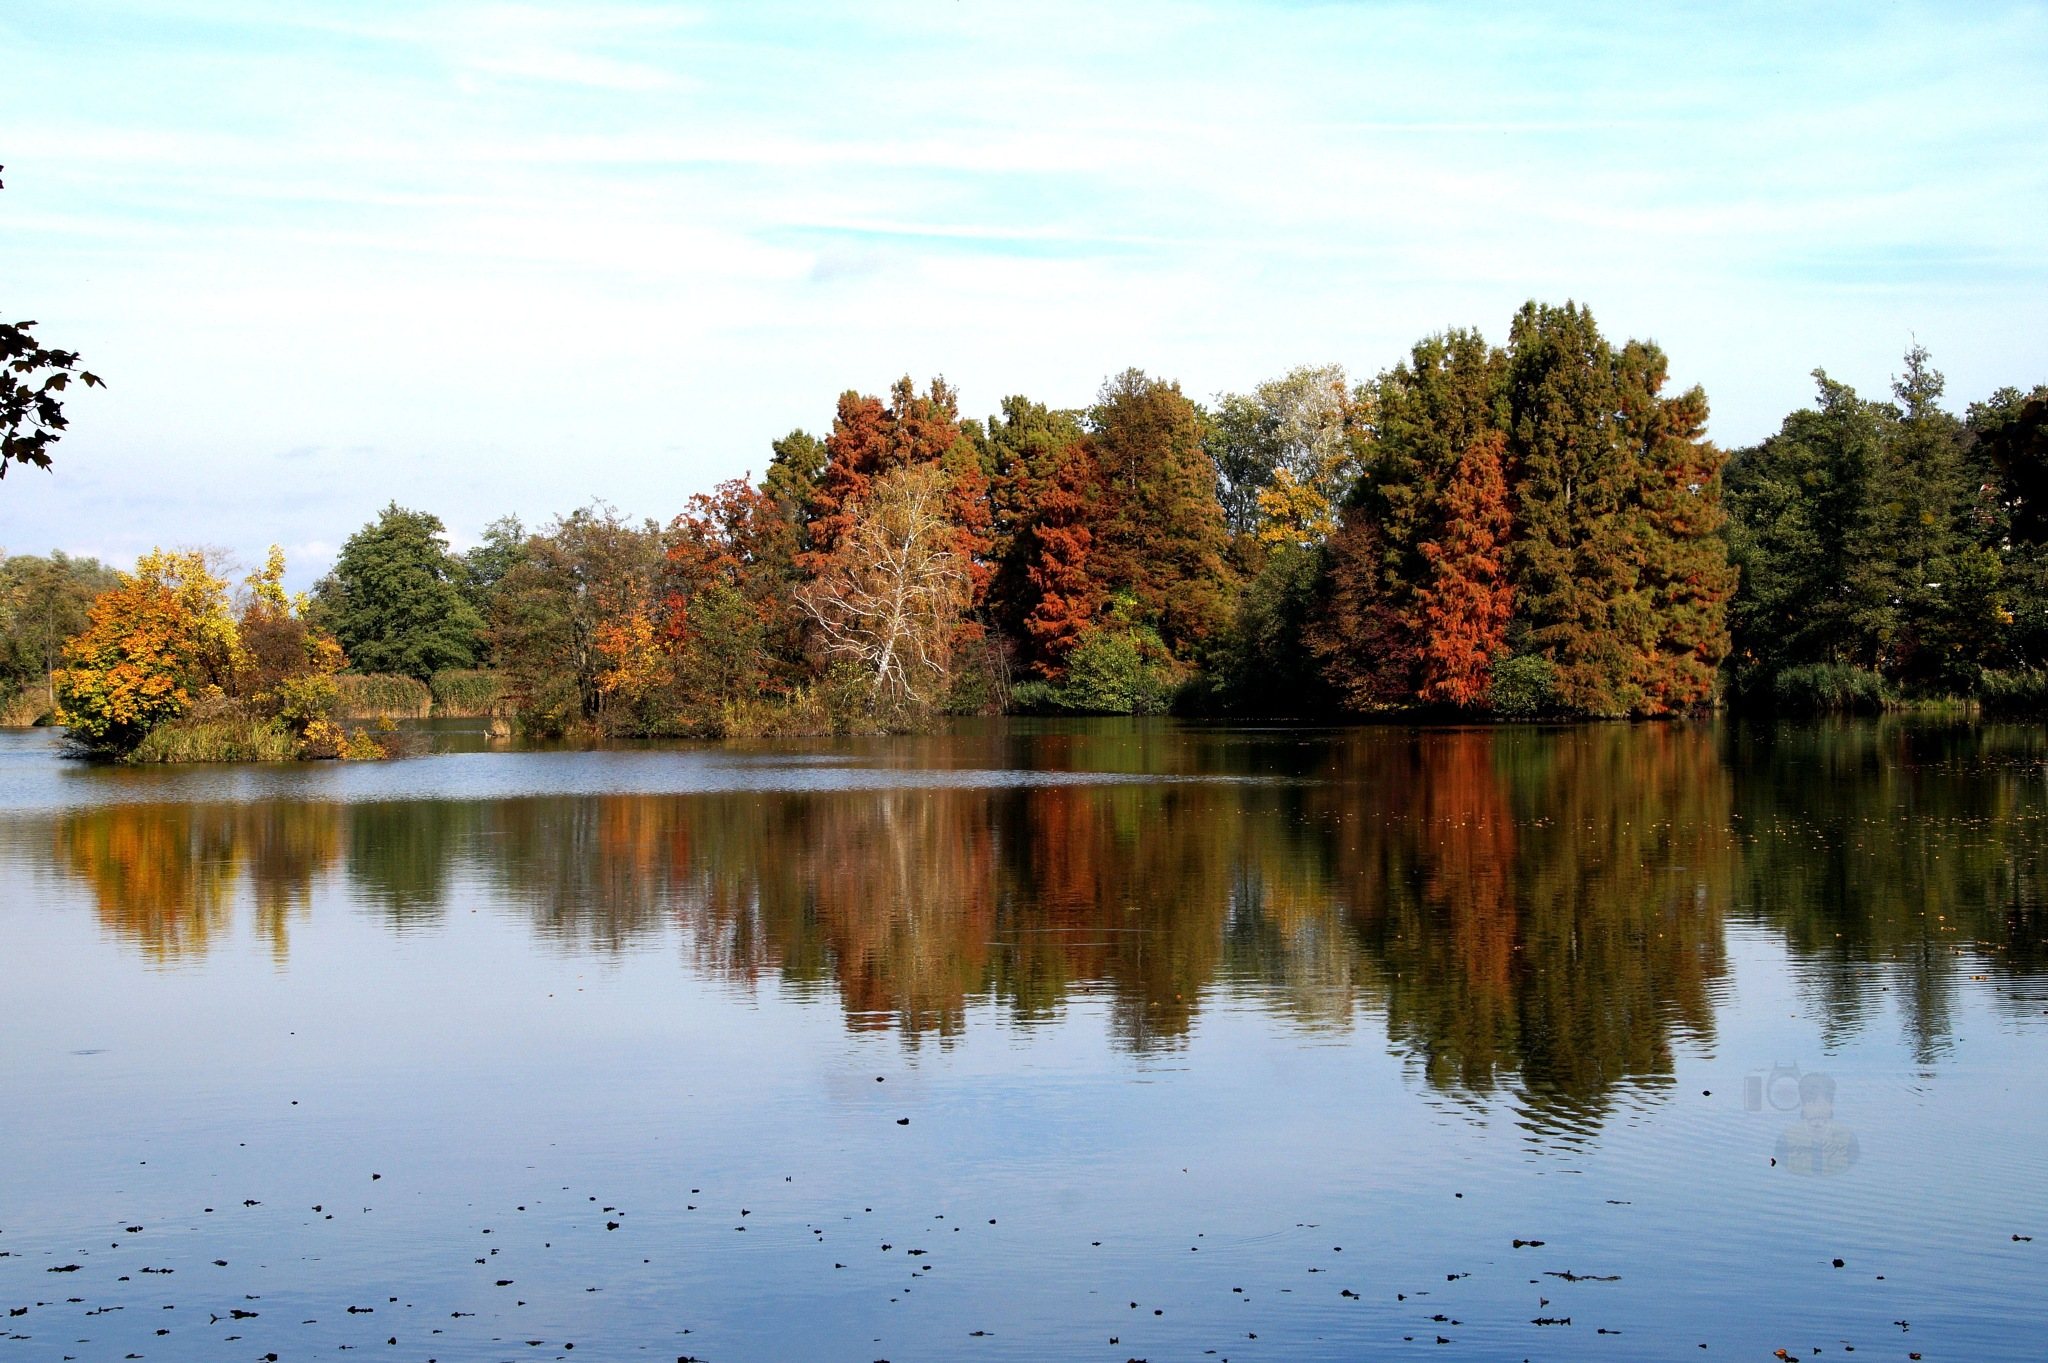 Oct.23, autumn reflection #1 by hunyadigeza